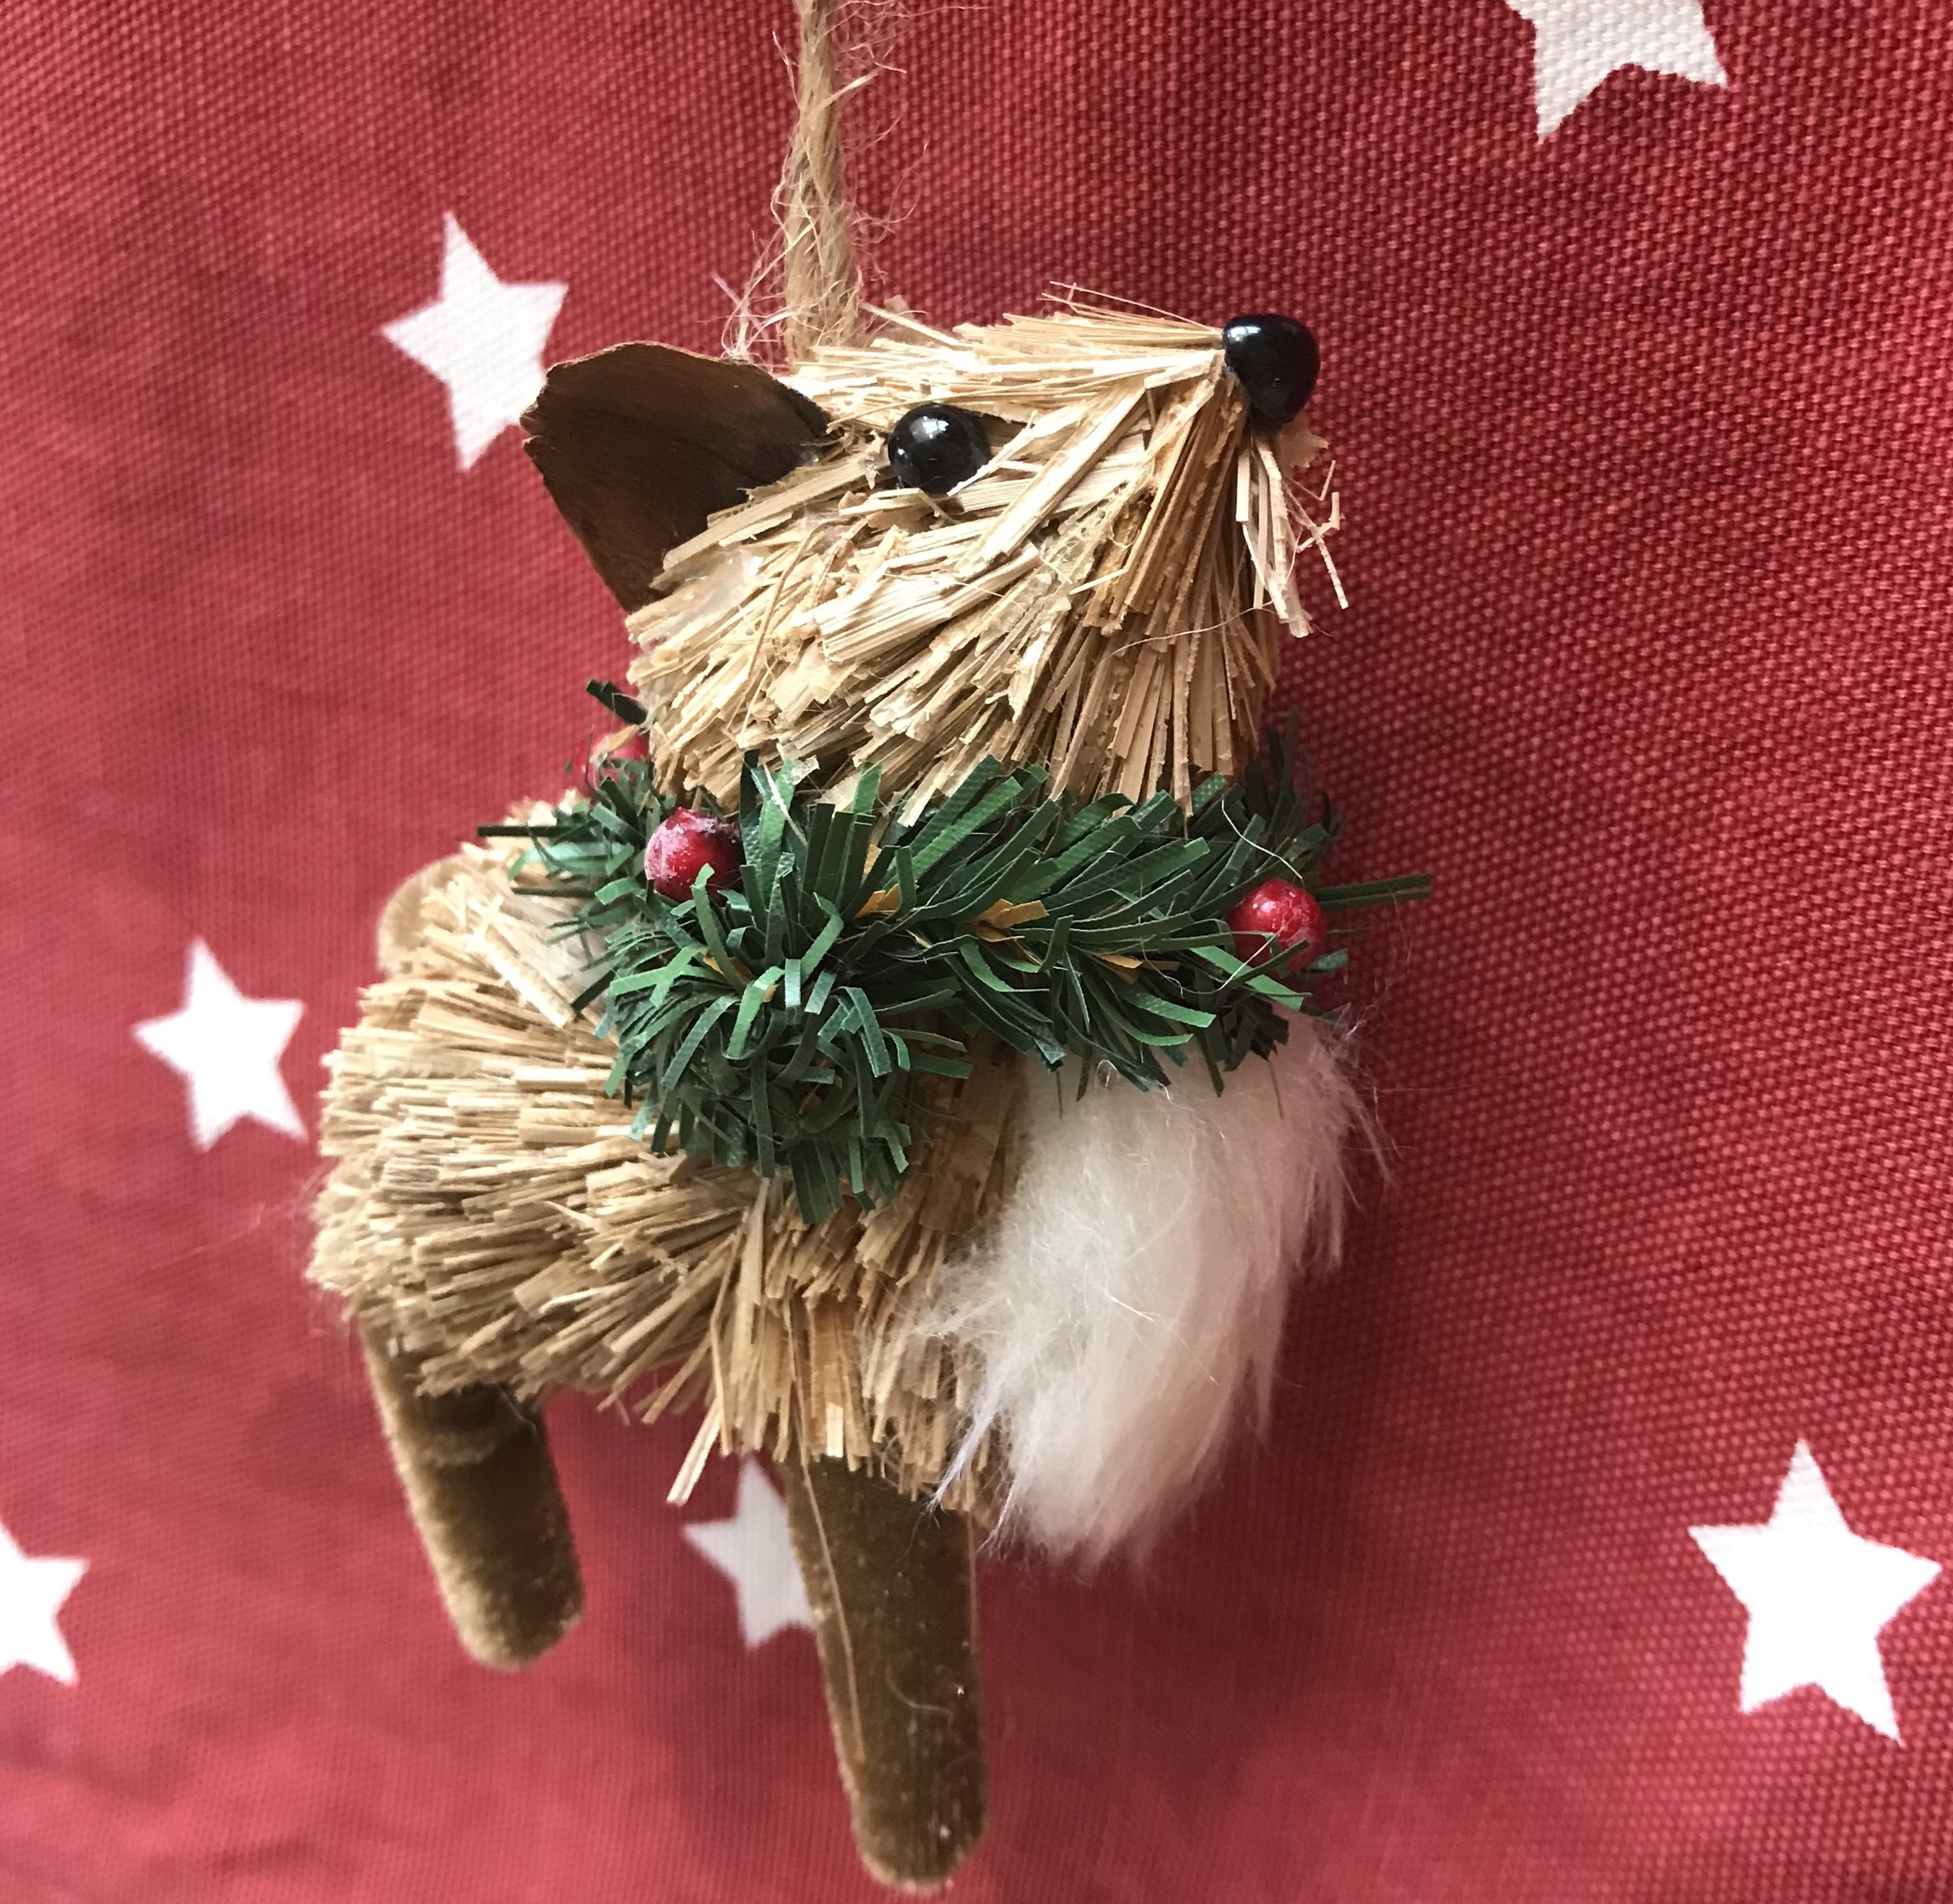 Baby Bristle Deer, Tree Decoration - was £5.75